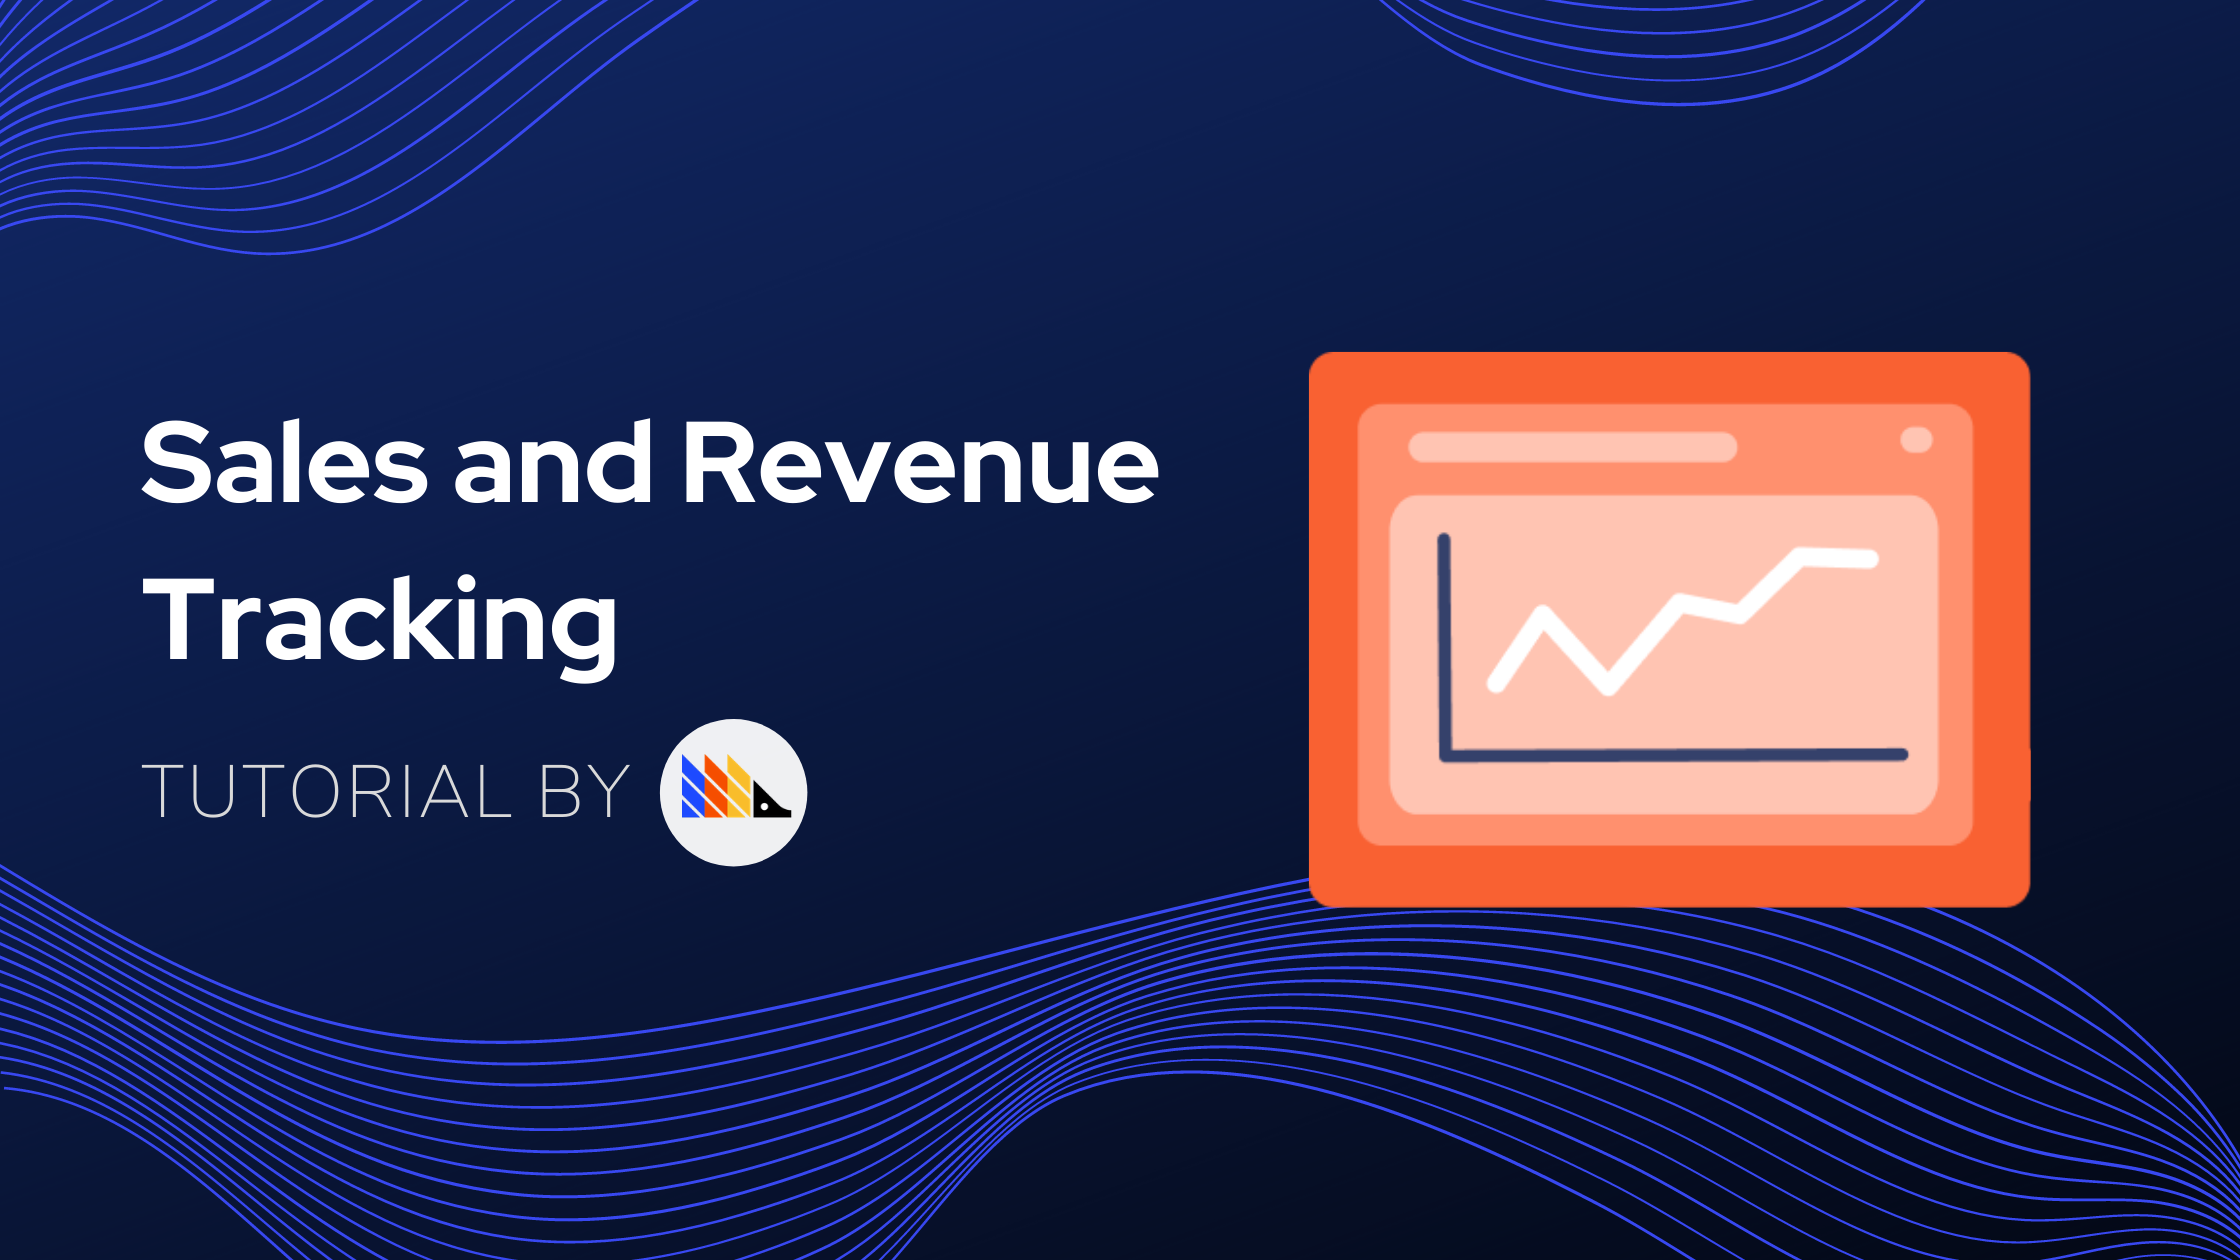 Revenue tracking banner image